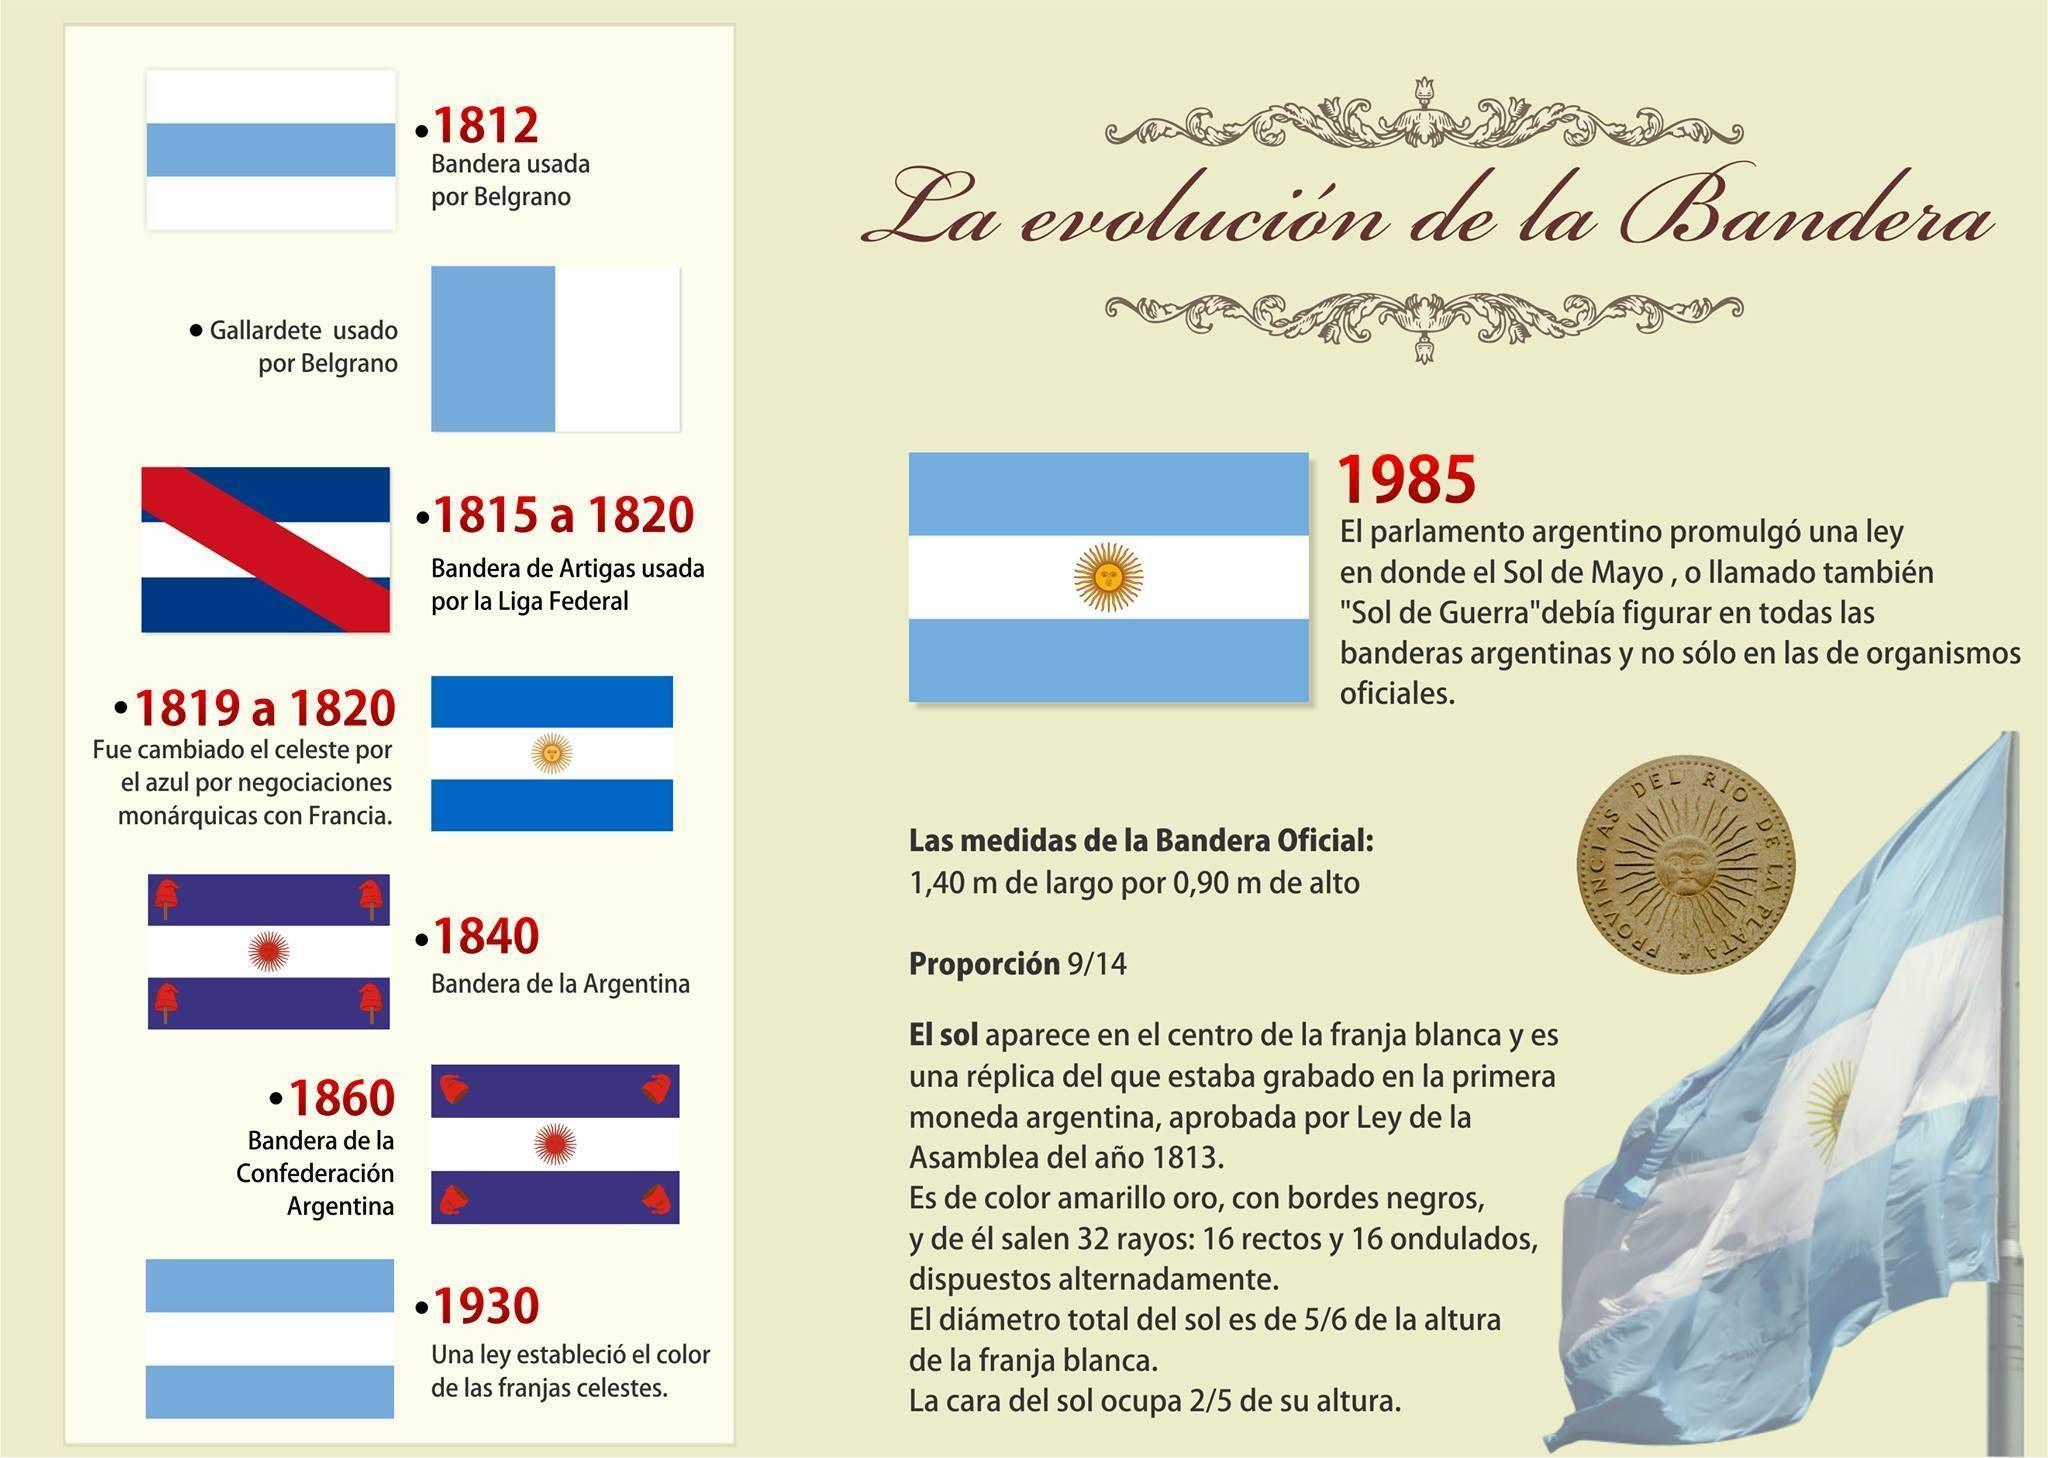 Bandera de evolucion argentina la historica